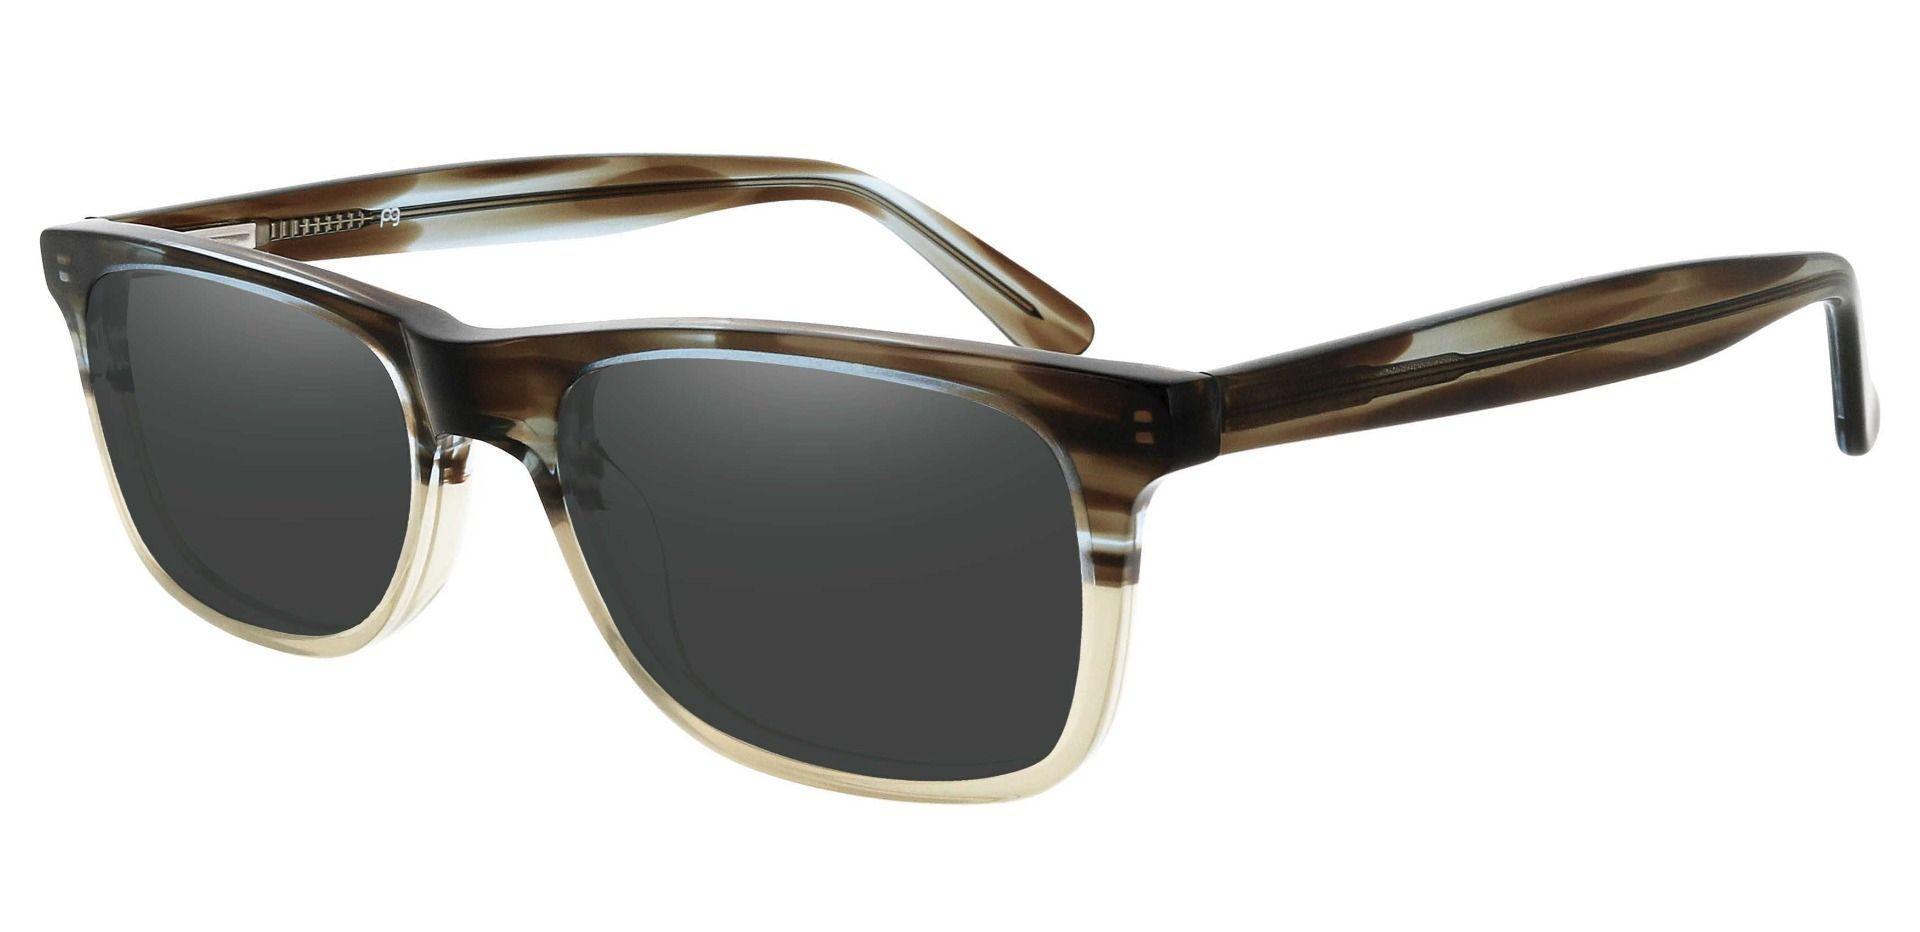 Denali Rectangle Non-Rx Sunglasses - Multi Color  Frame With Gray Lenses